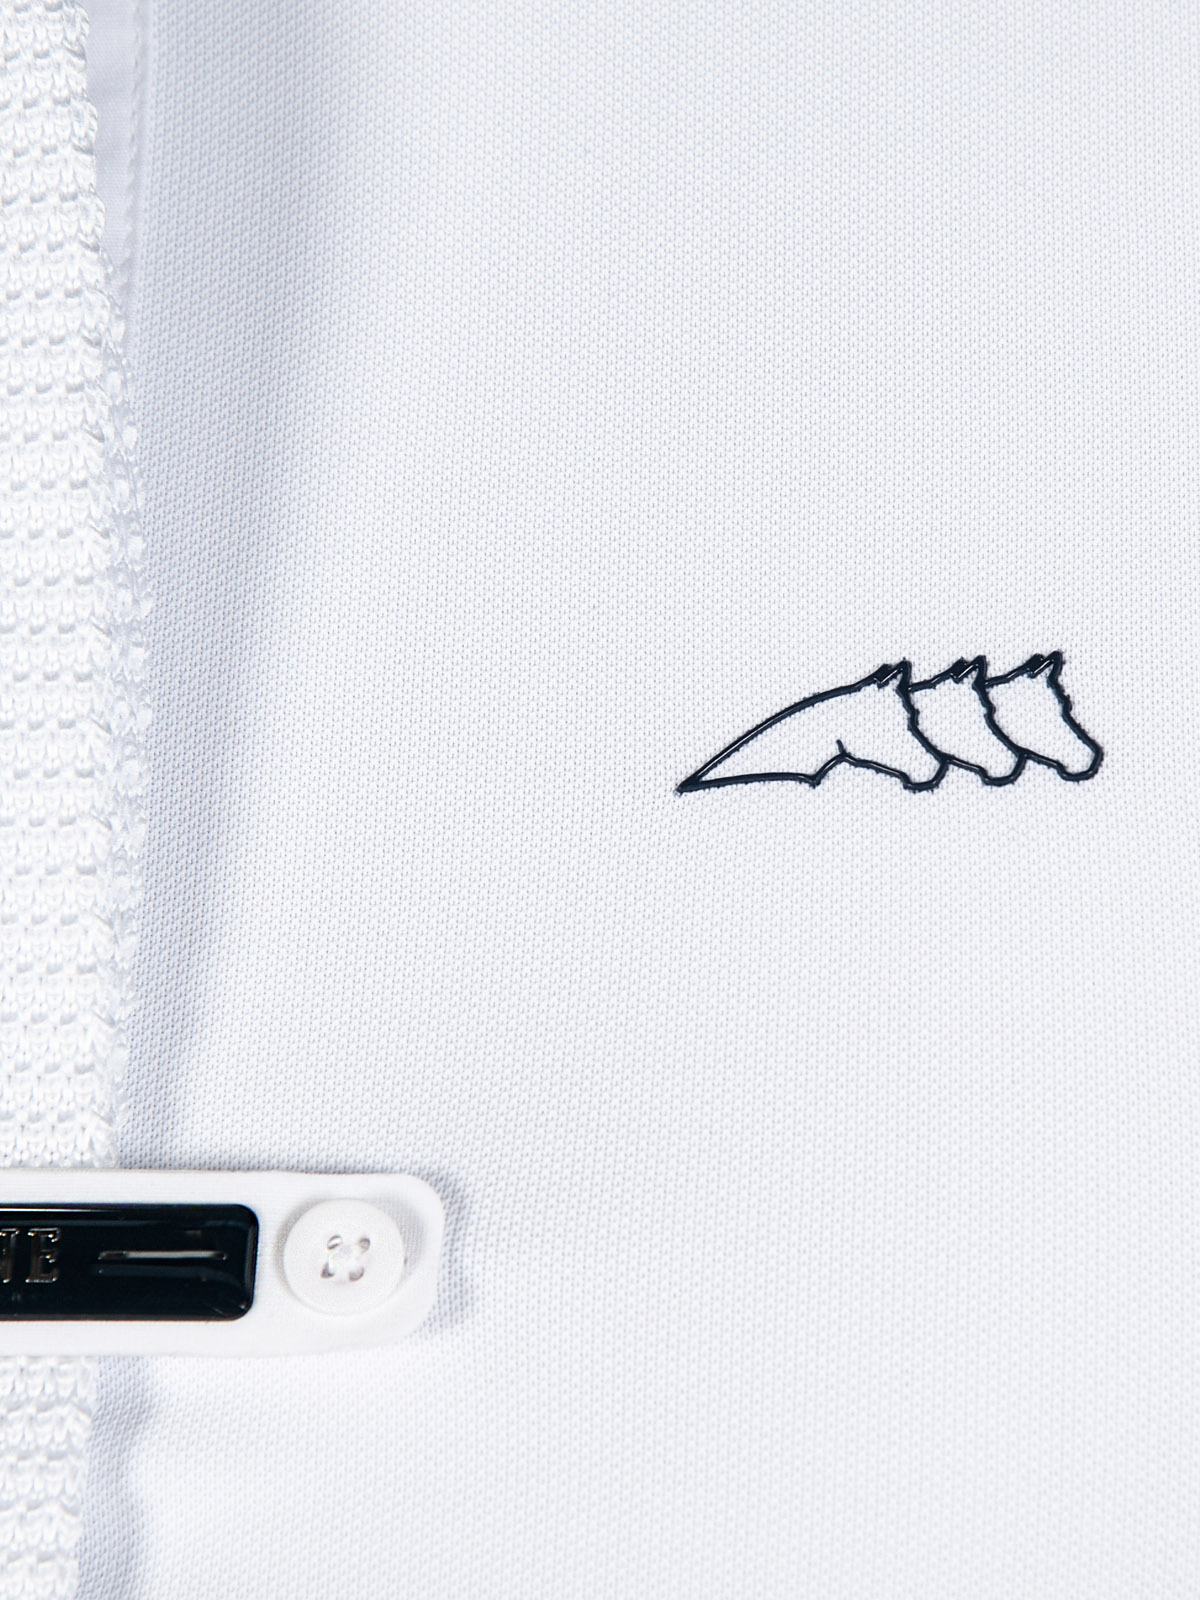 VICK - Men's Short Sleeve Show Shirt 3